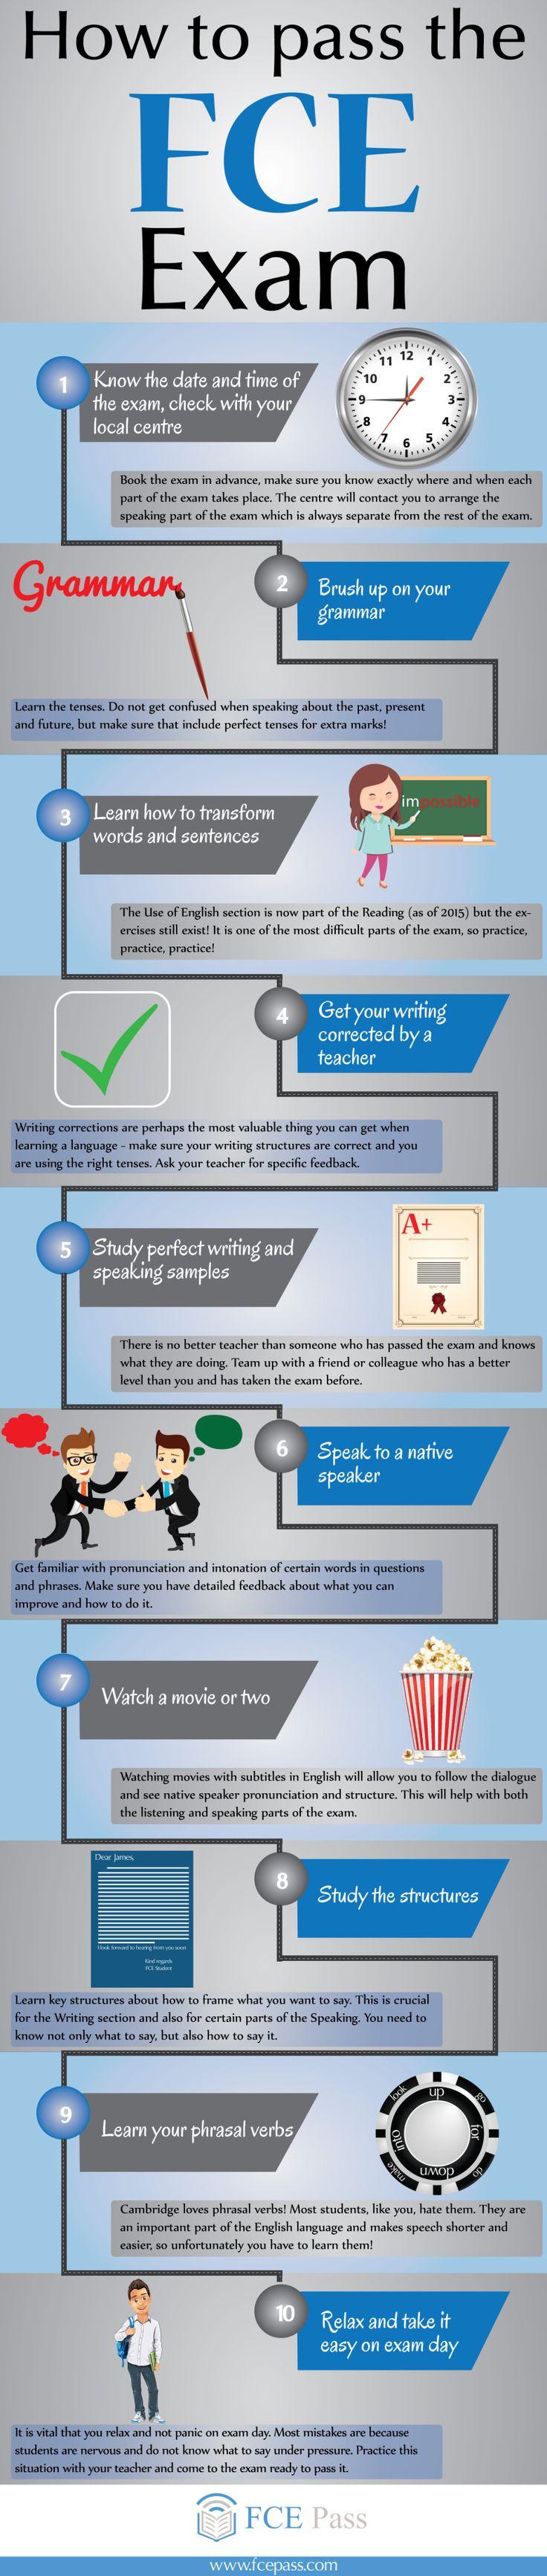 How to pass the Cambridge First Certificate Exam (FCE)   James Warwick   LinkedIn